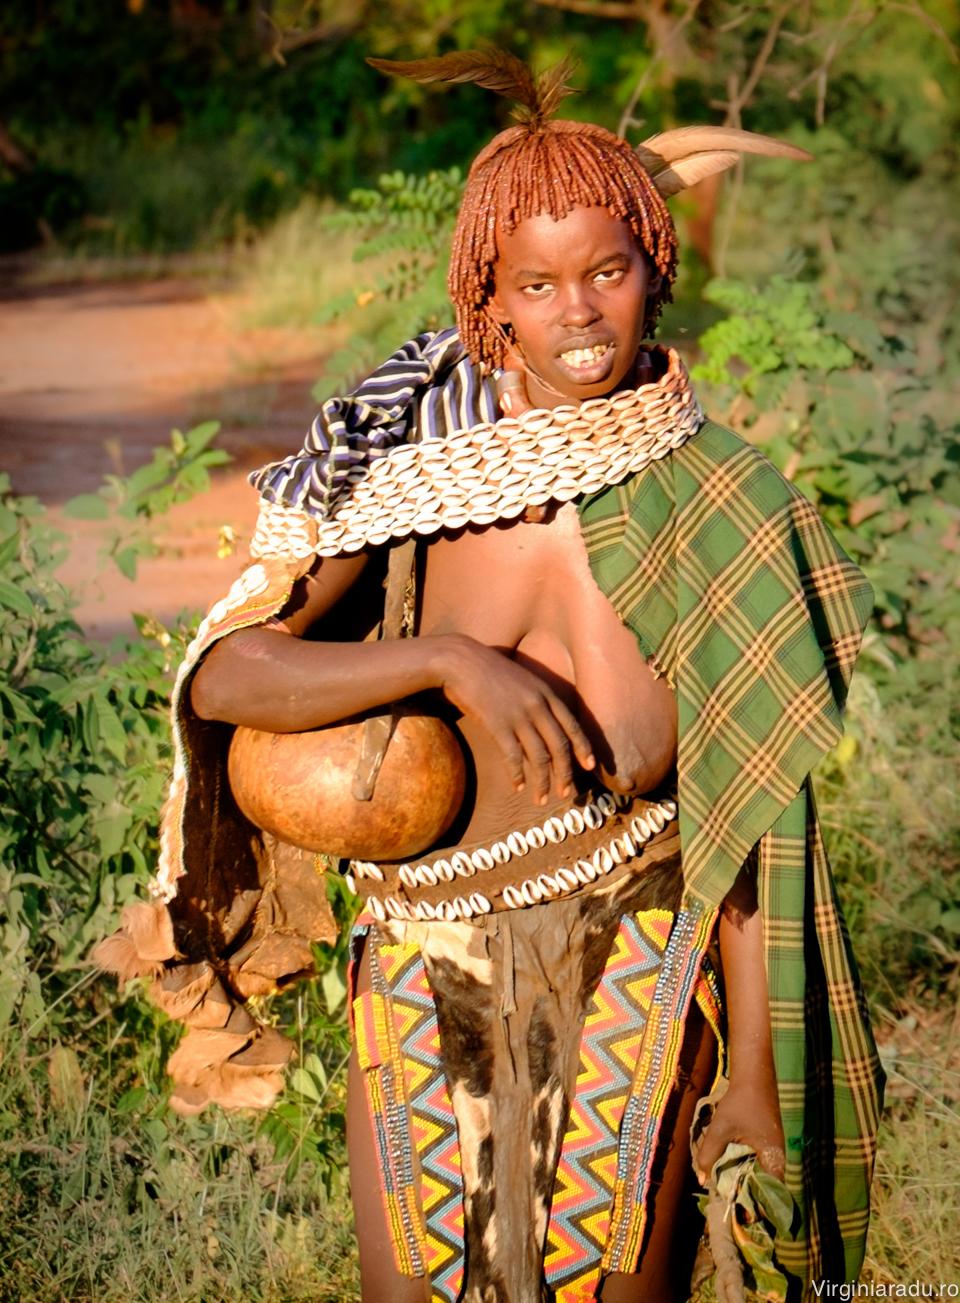 apartinatorii tribului cred ca anumite obiecte din natura precum roci sau copaci sunt insufletite